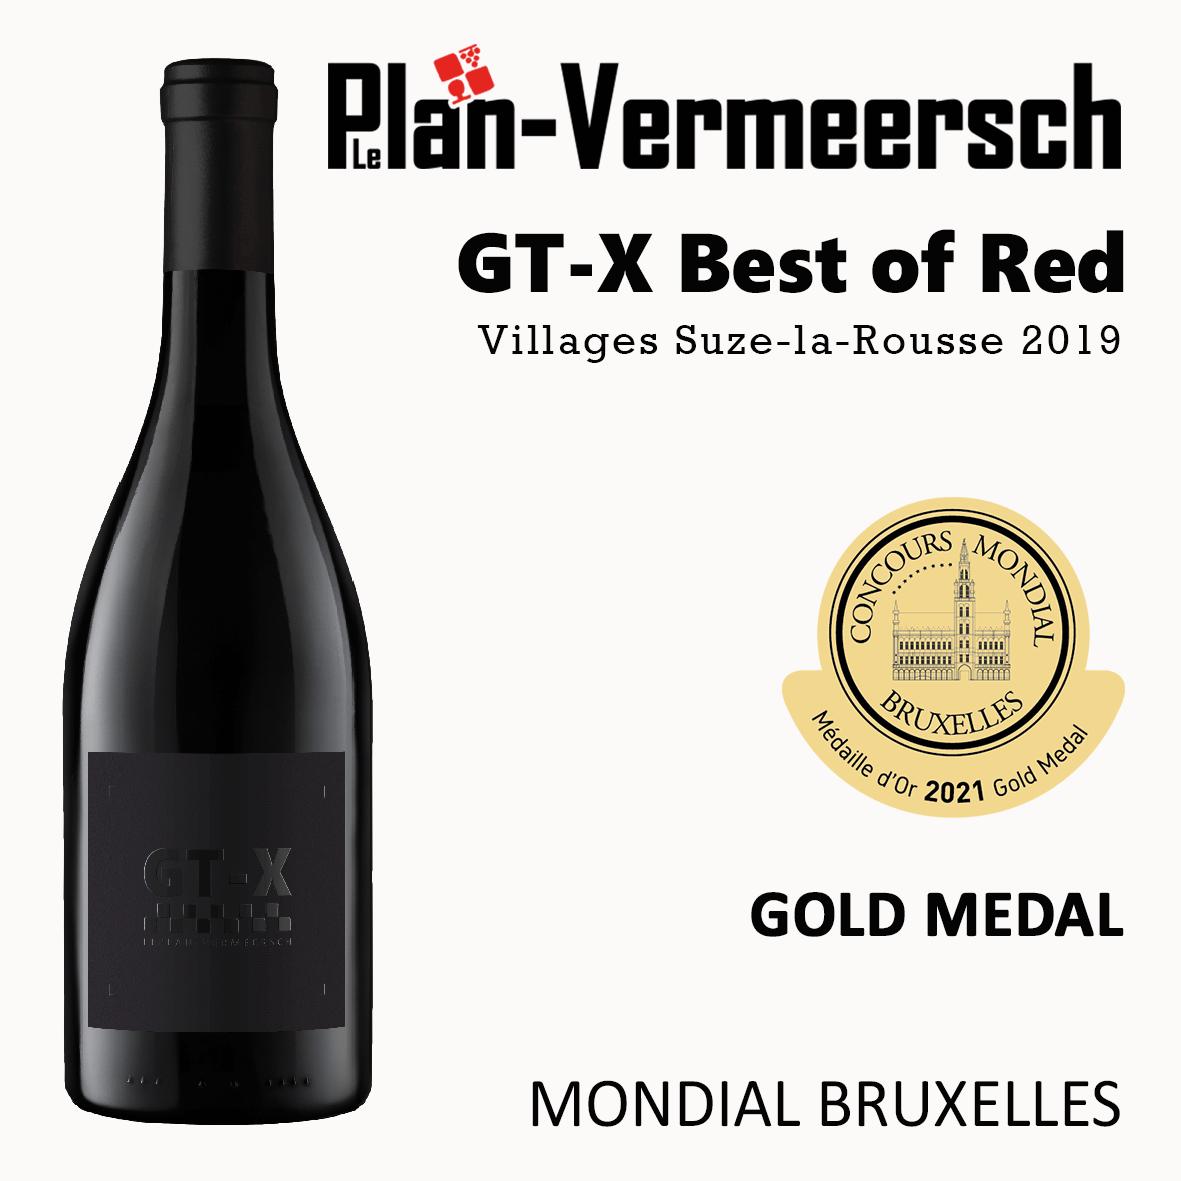 Bottle blend grenache syrah carignan mourvèdre viognier wine mondial Bruxelles gold medal Leplan-Vermersch